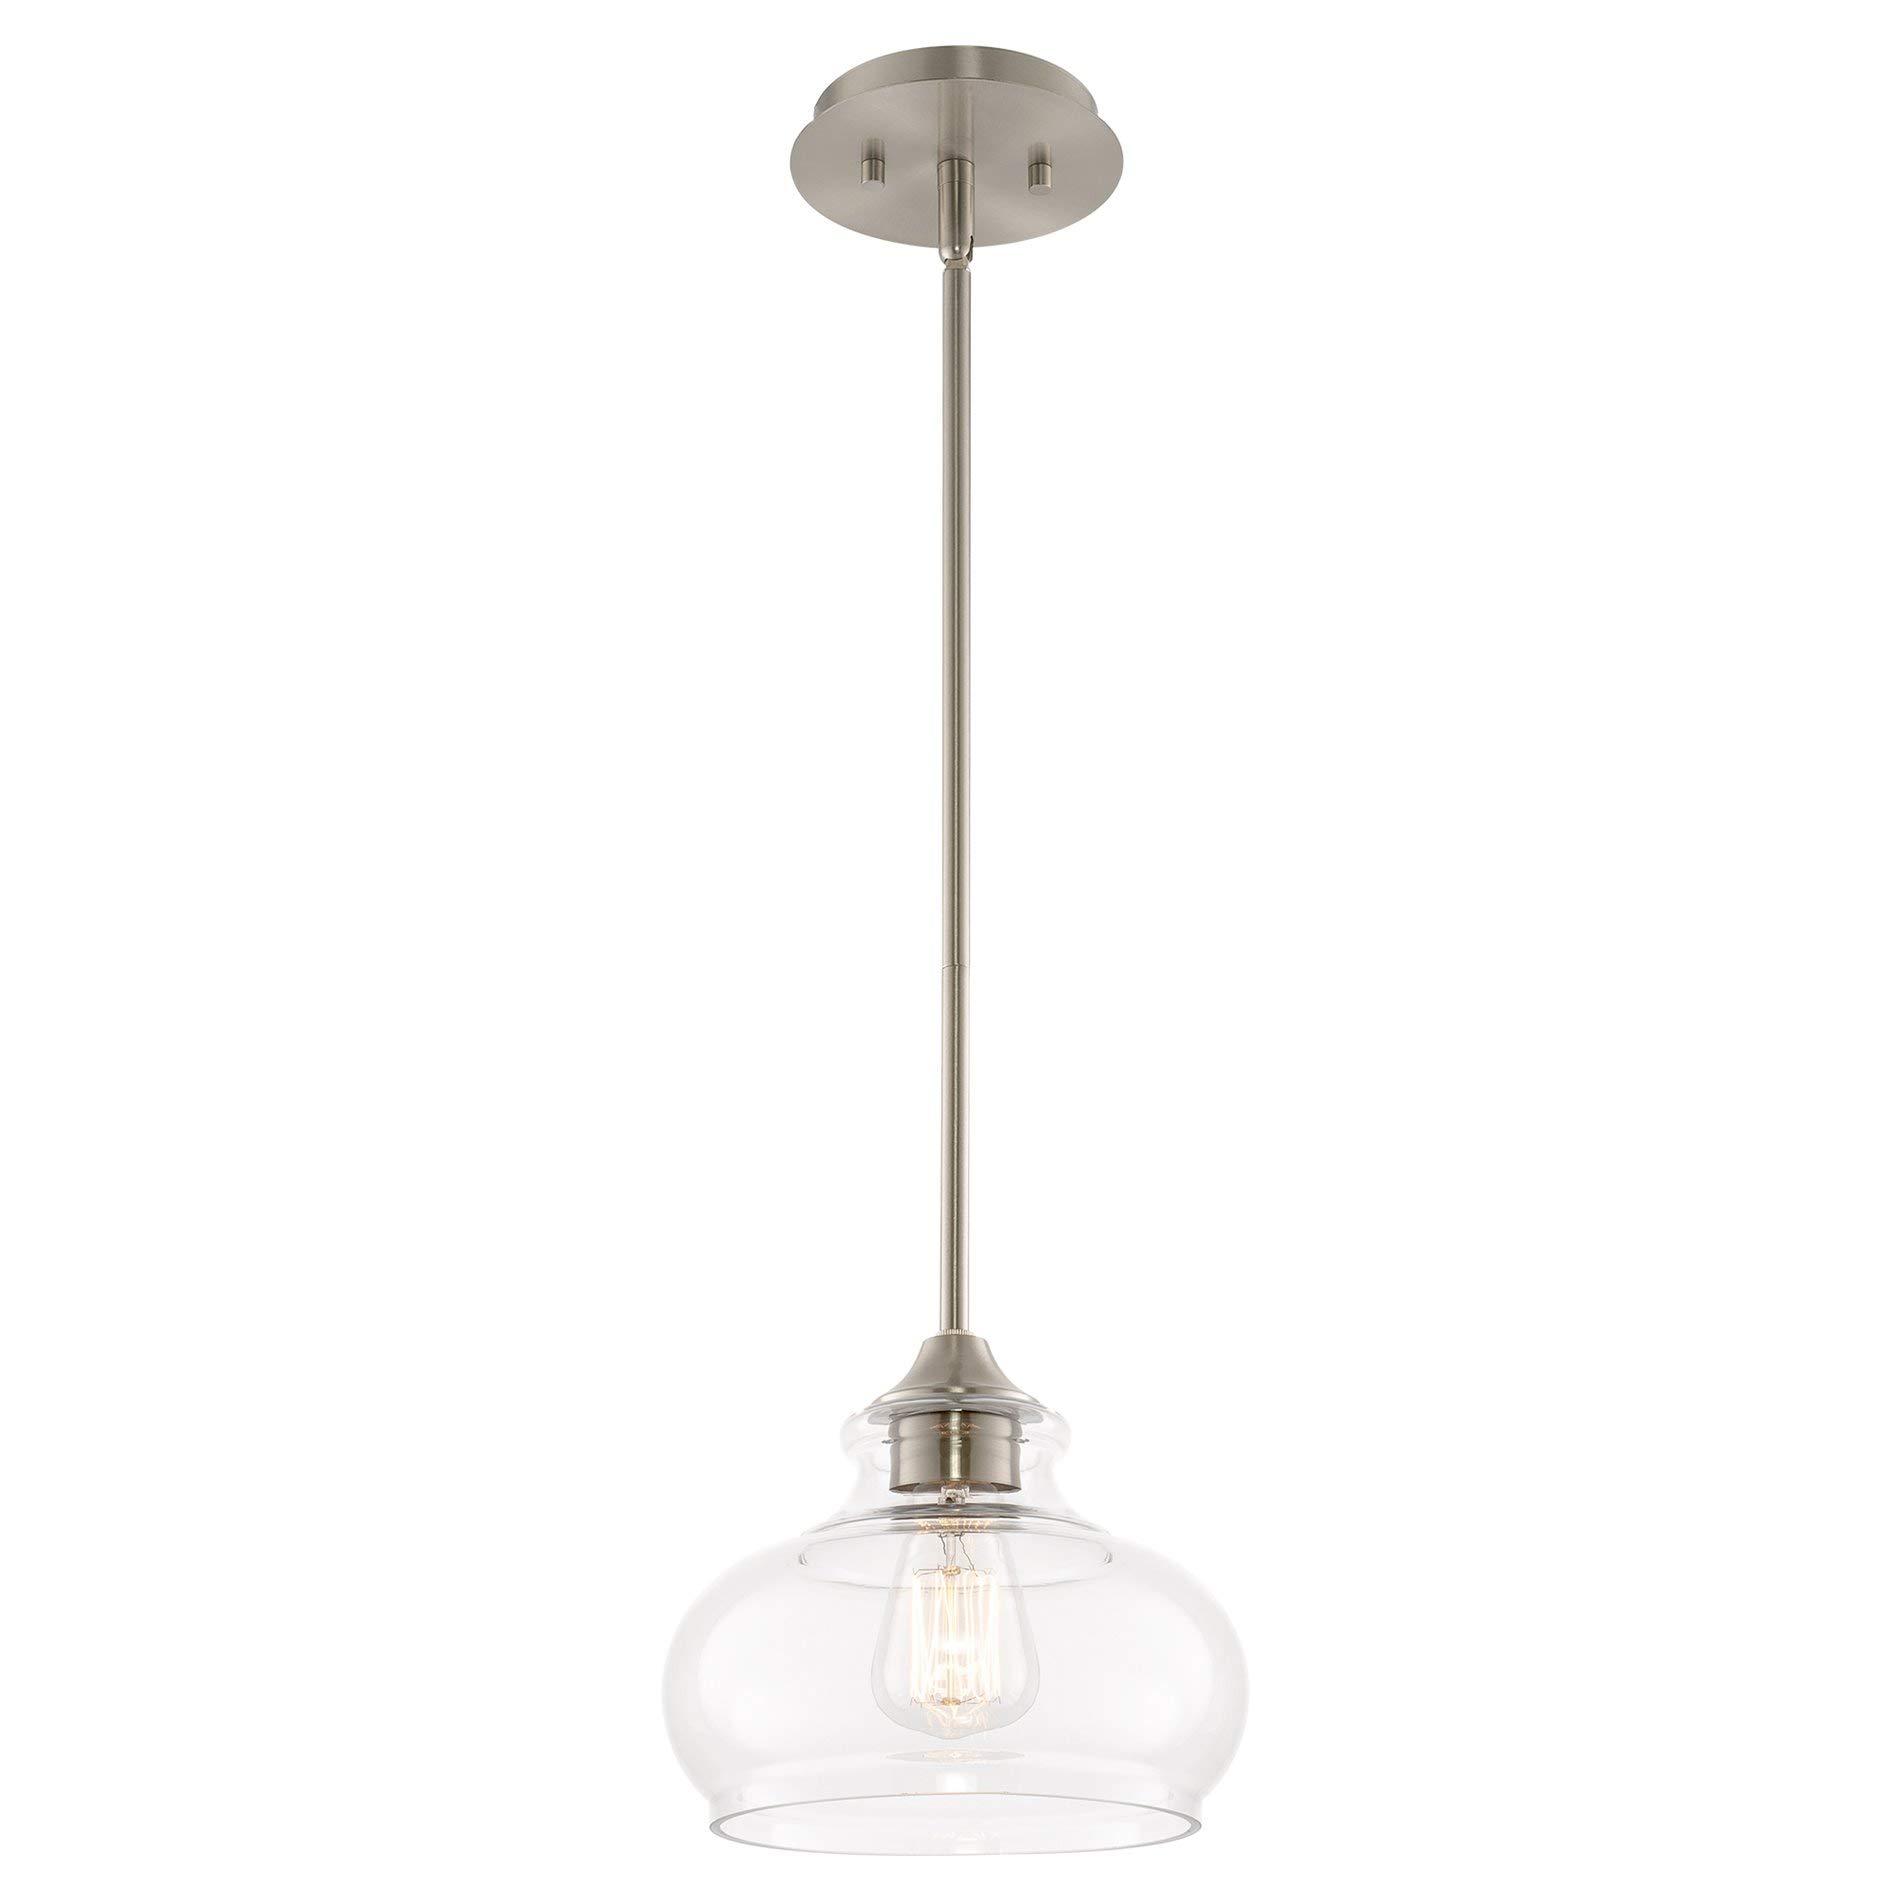 ETL Listed CRI 90+ 40 Watt Equivalent Integrated LED Kitchen Lighting 640lm Premium Bubble Glass with Chromed Finished Hykolity 1-Light Mini Pendant Ceiling Fixture 8.5W